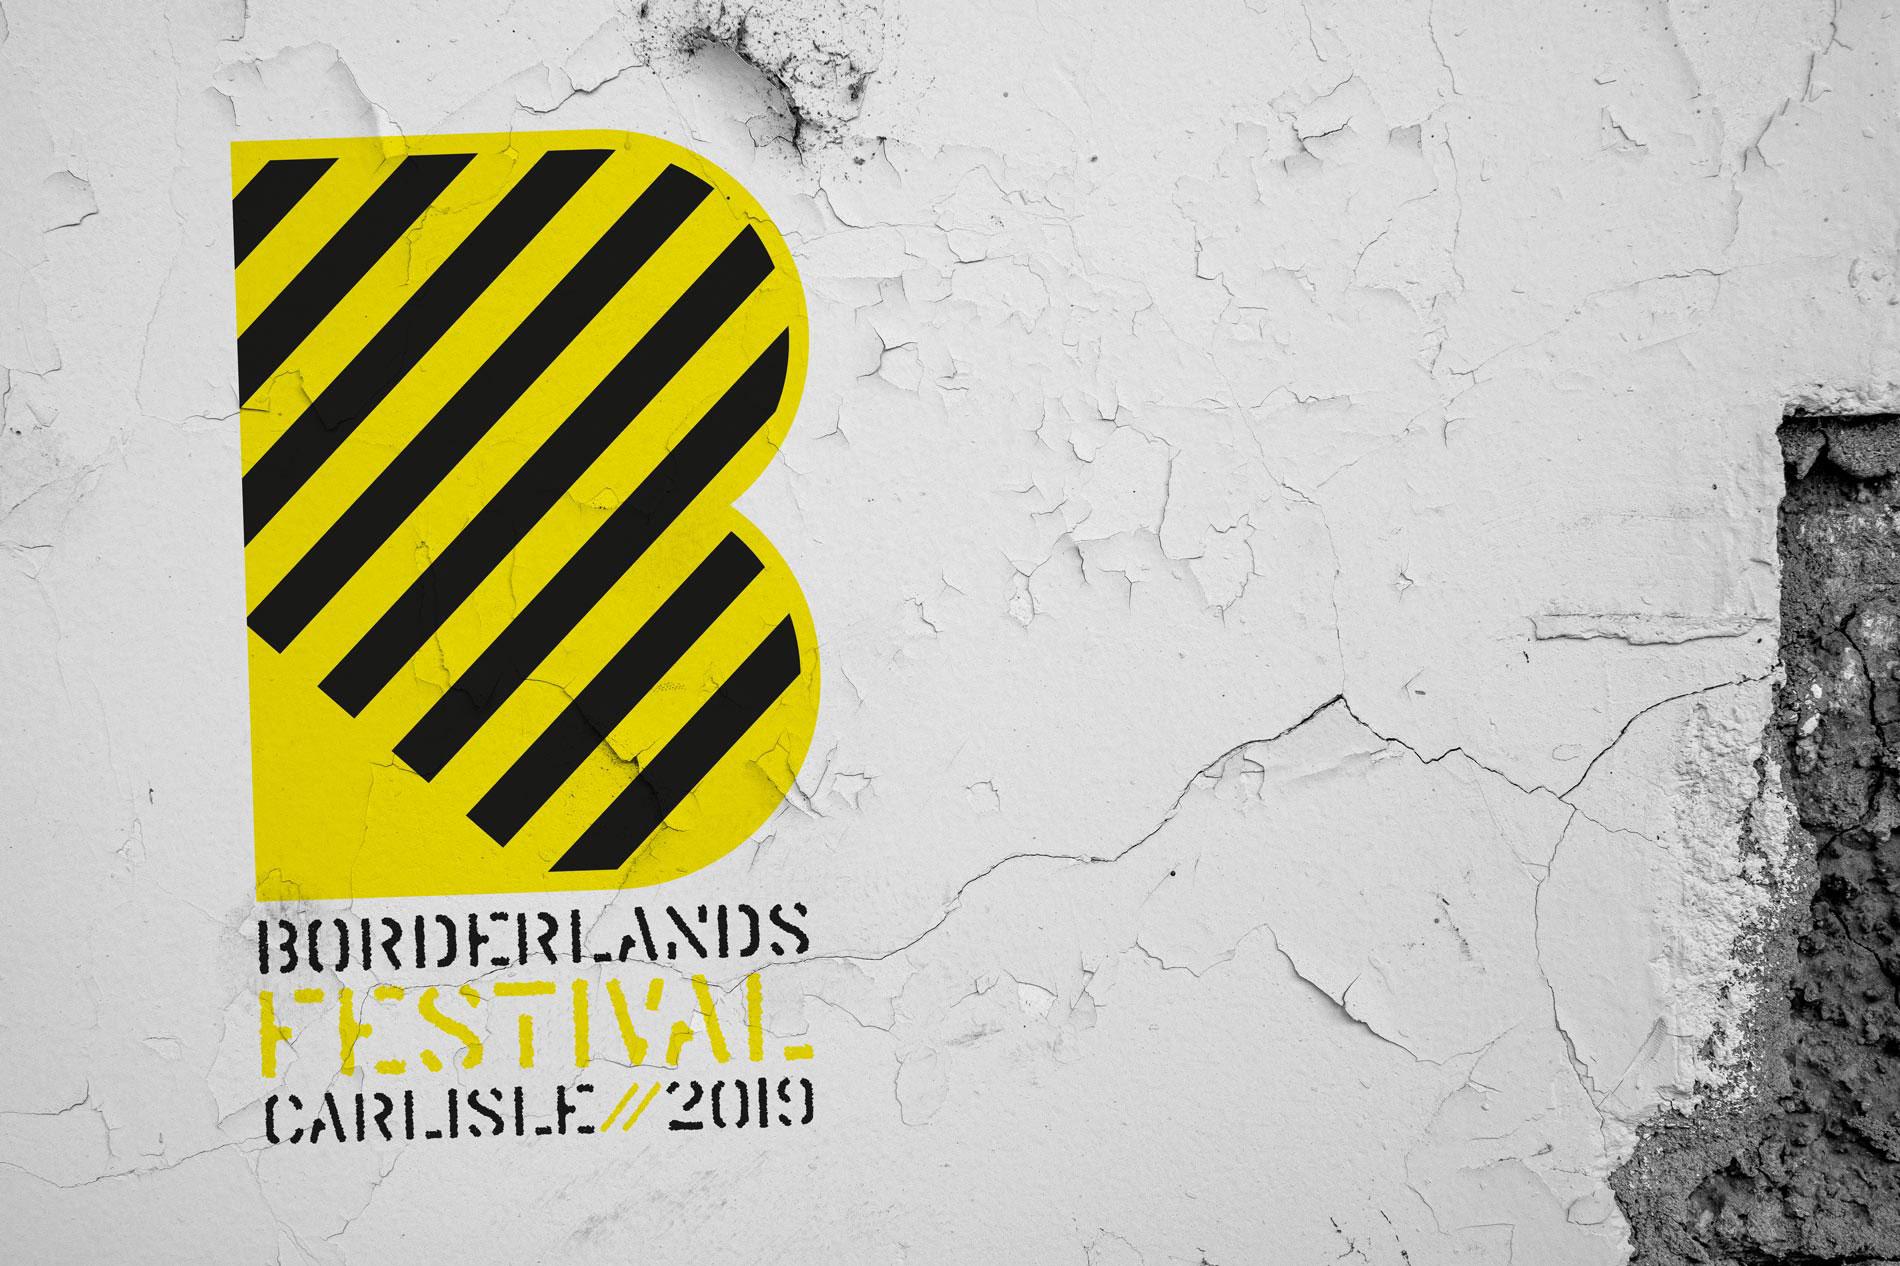 Eden Arts Borderlands 2019 Brand Identity Concepts